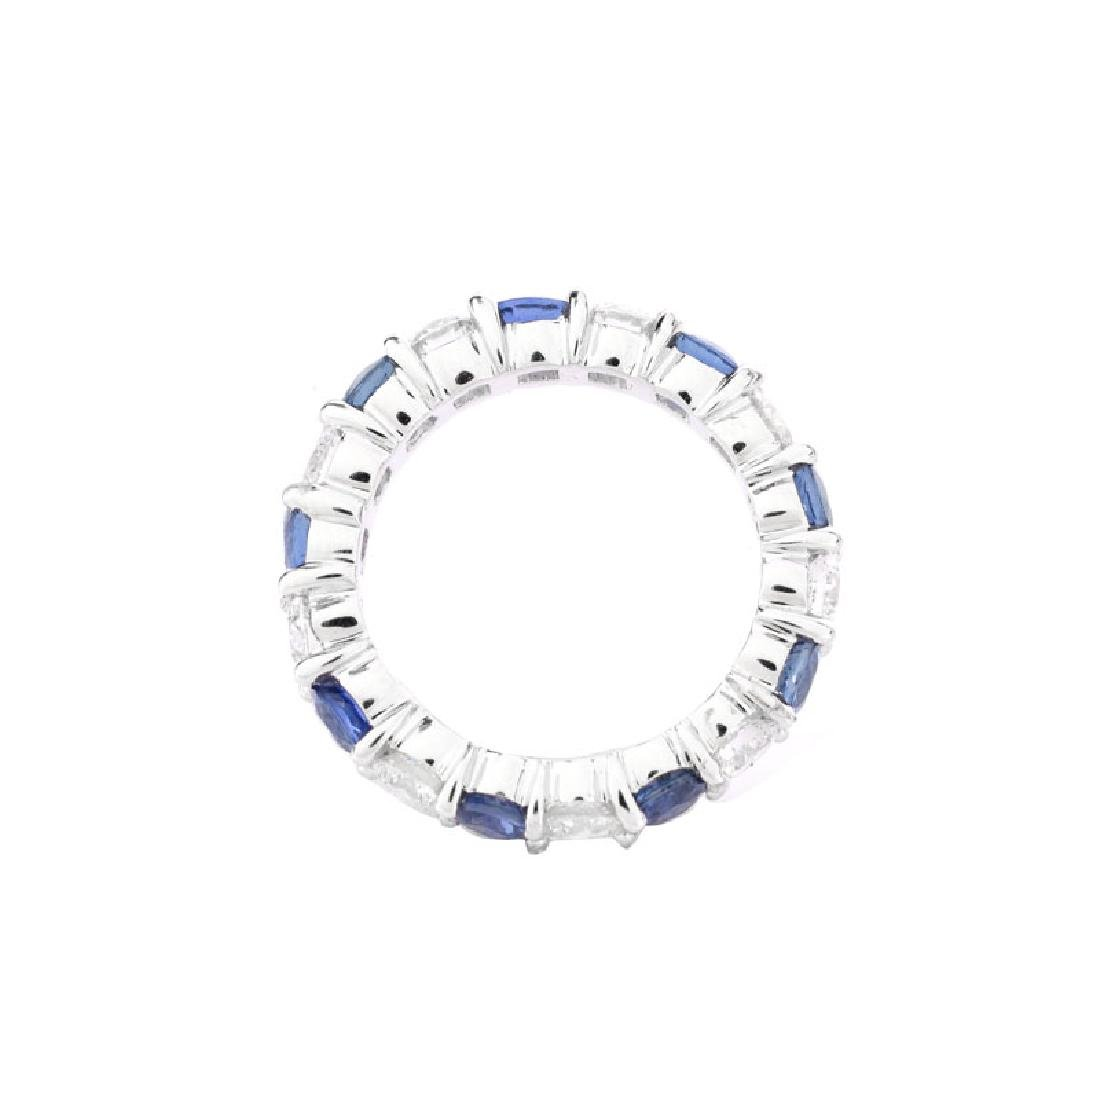 Approx. 2.62 Carat Round Brilliant Cut Sapphire, 1.85 - 4